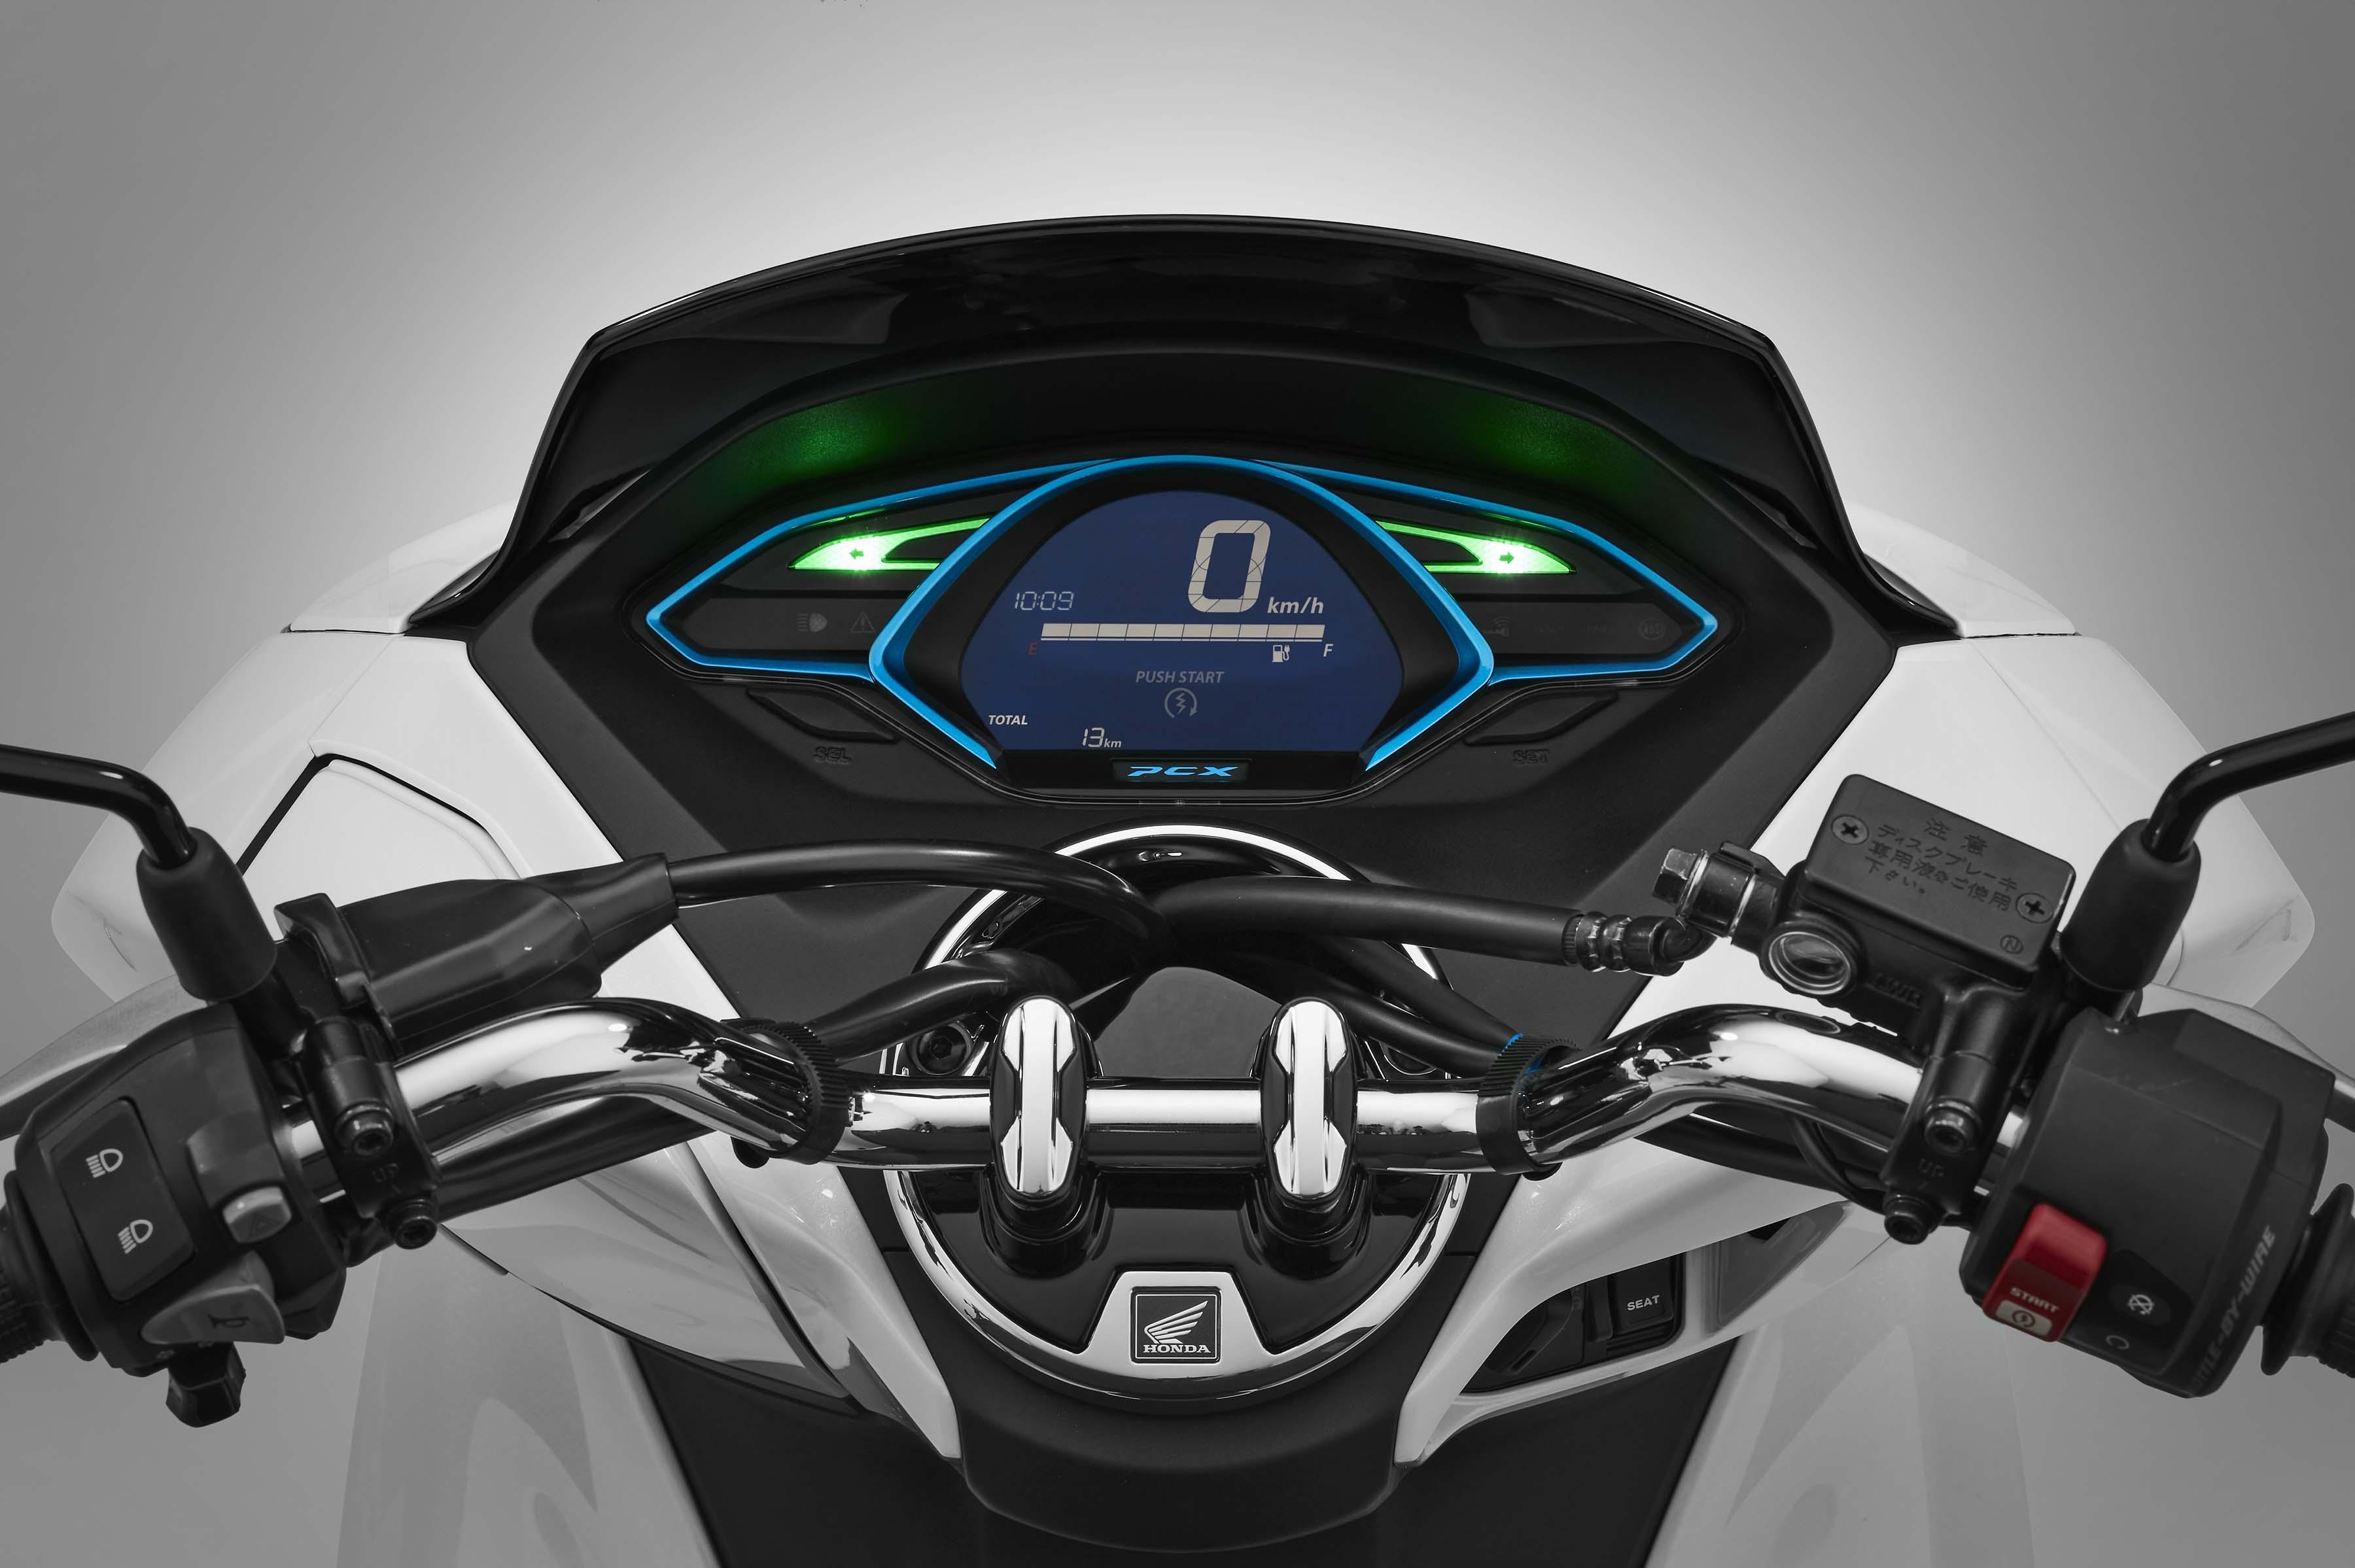 honda debuts hybrid and electric scooters for 2018 asphalt rubber. Black Bedroom Furniture Sets. Home Design Ideas